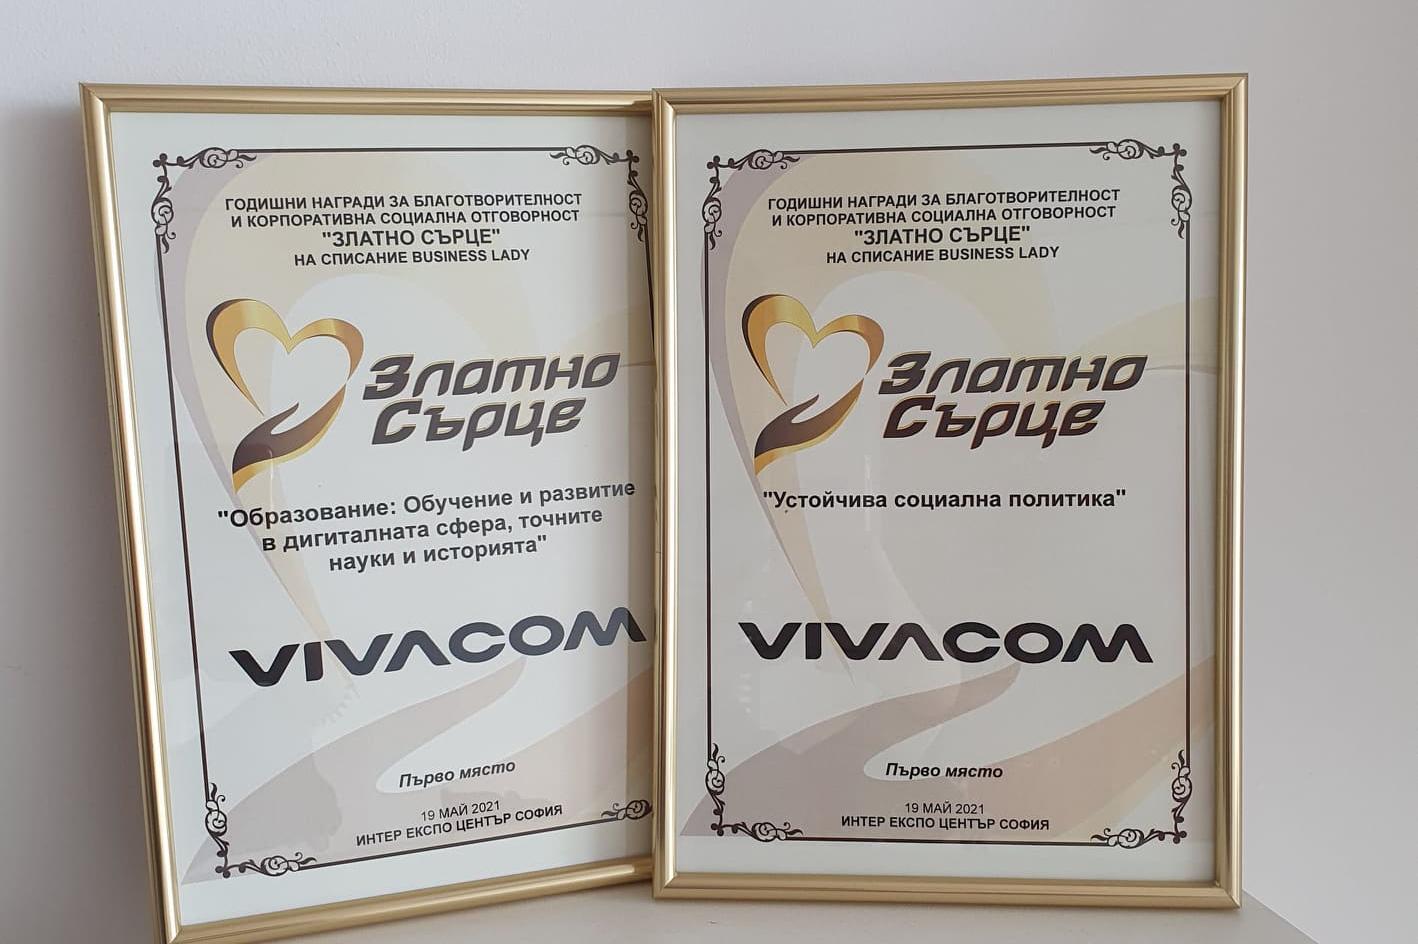 Vivacom - Златно сърце